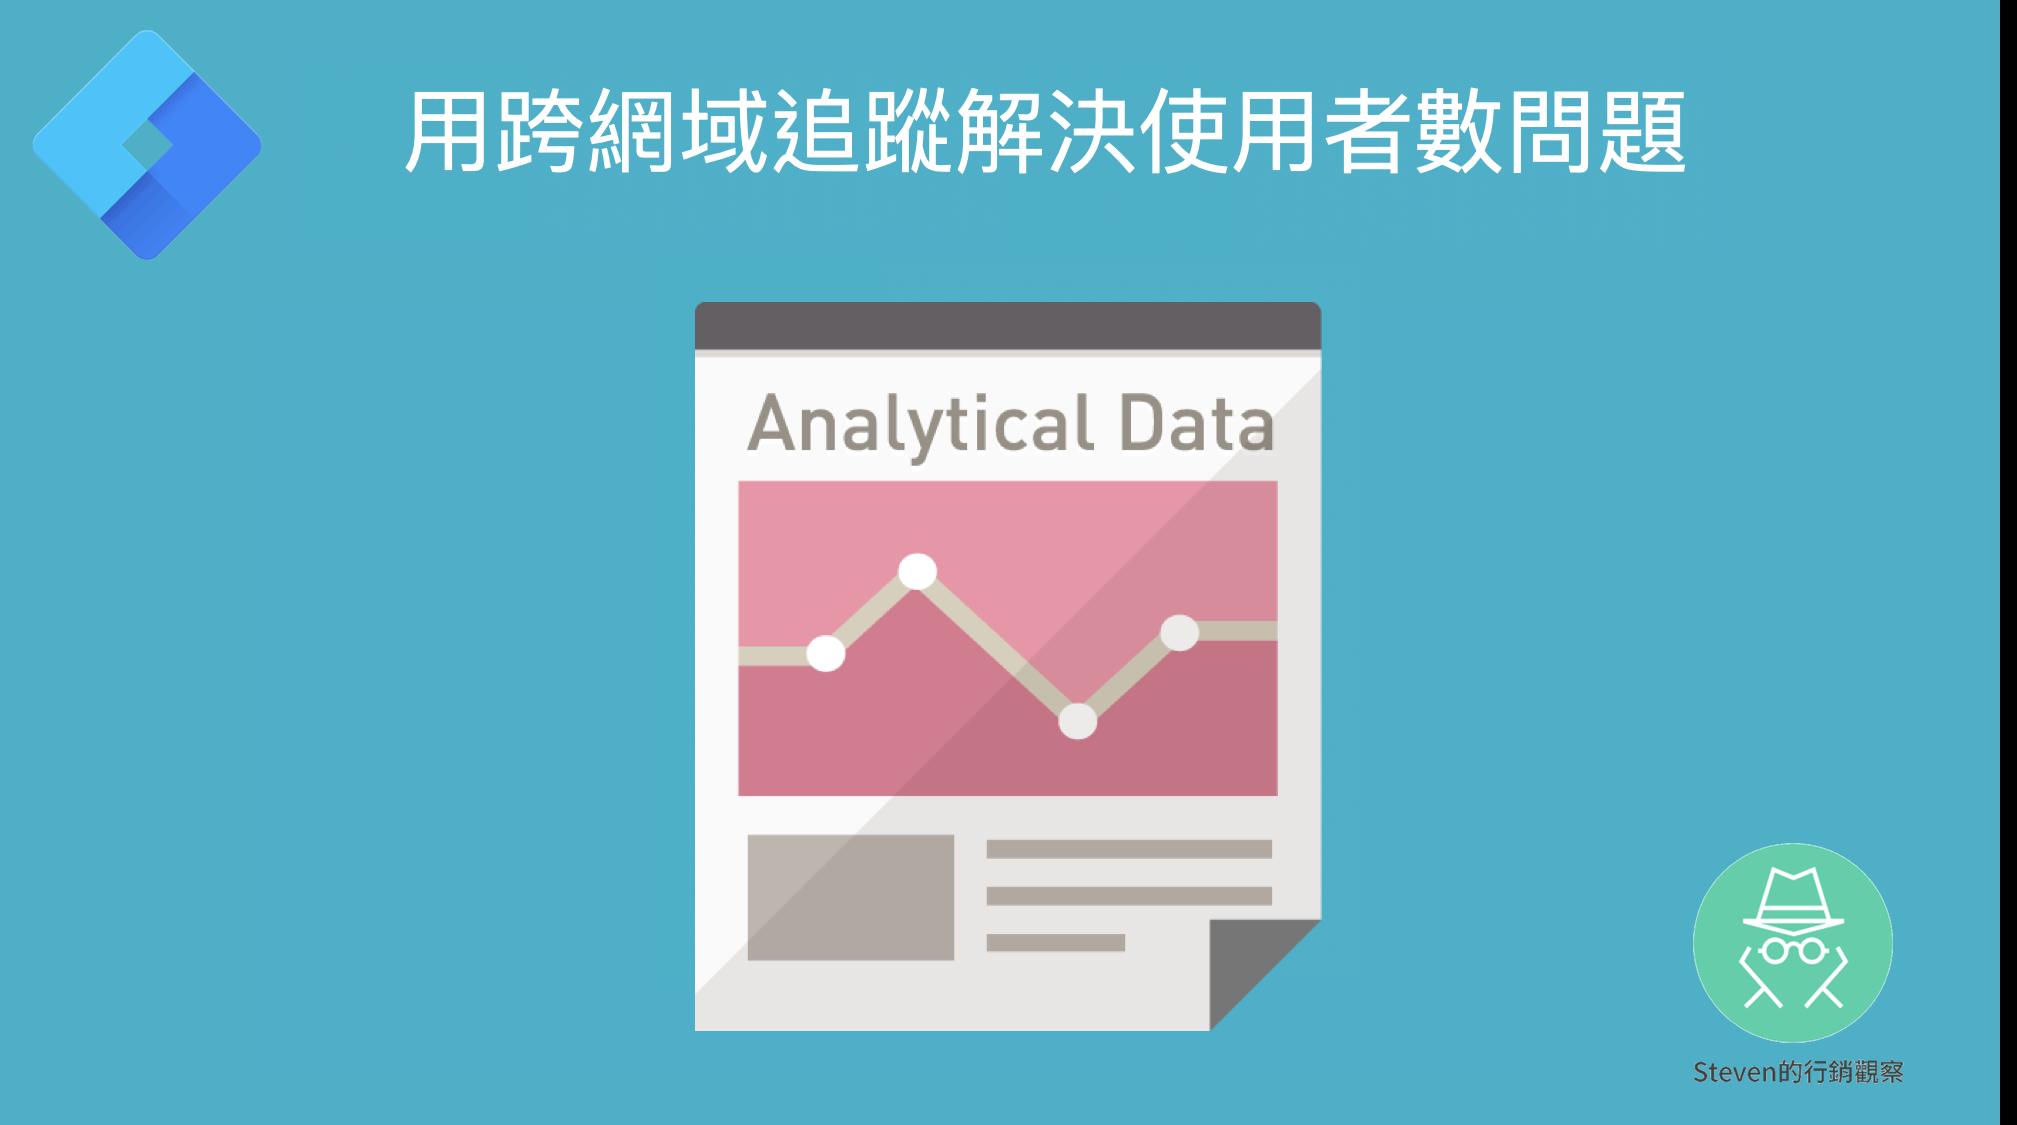 GTM教學(十七)-用跨網域追蹤找出真正的用戶數(上)